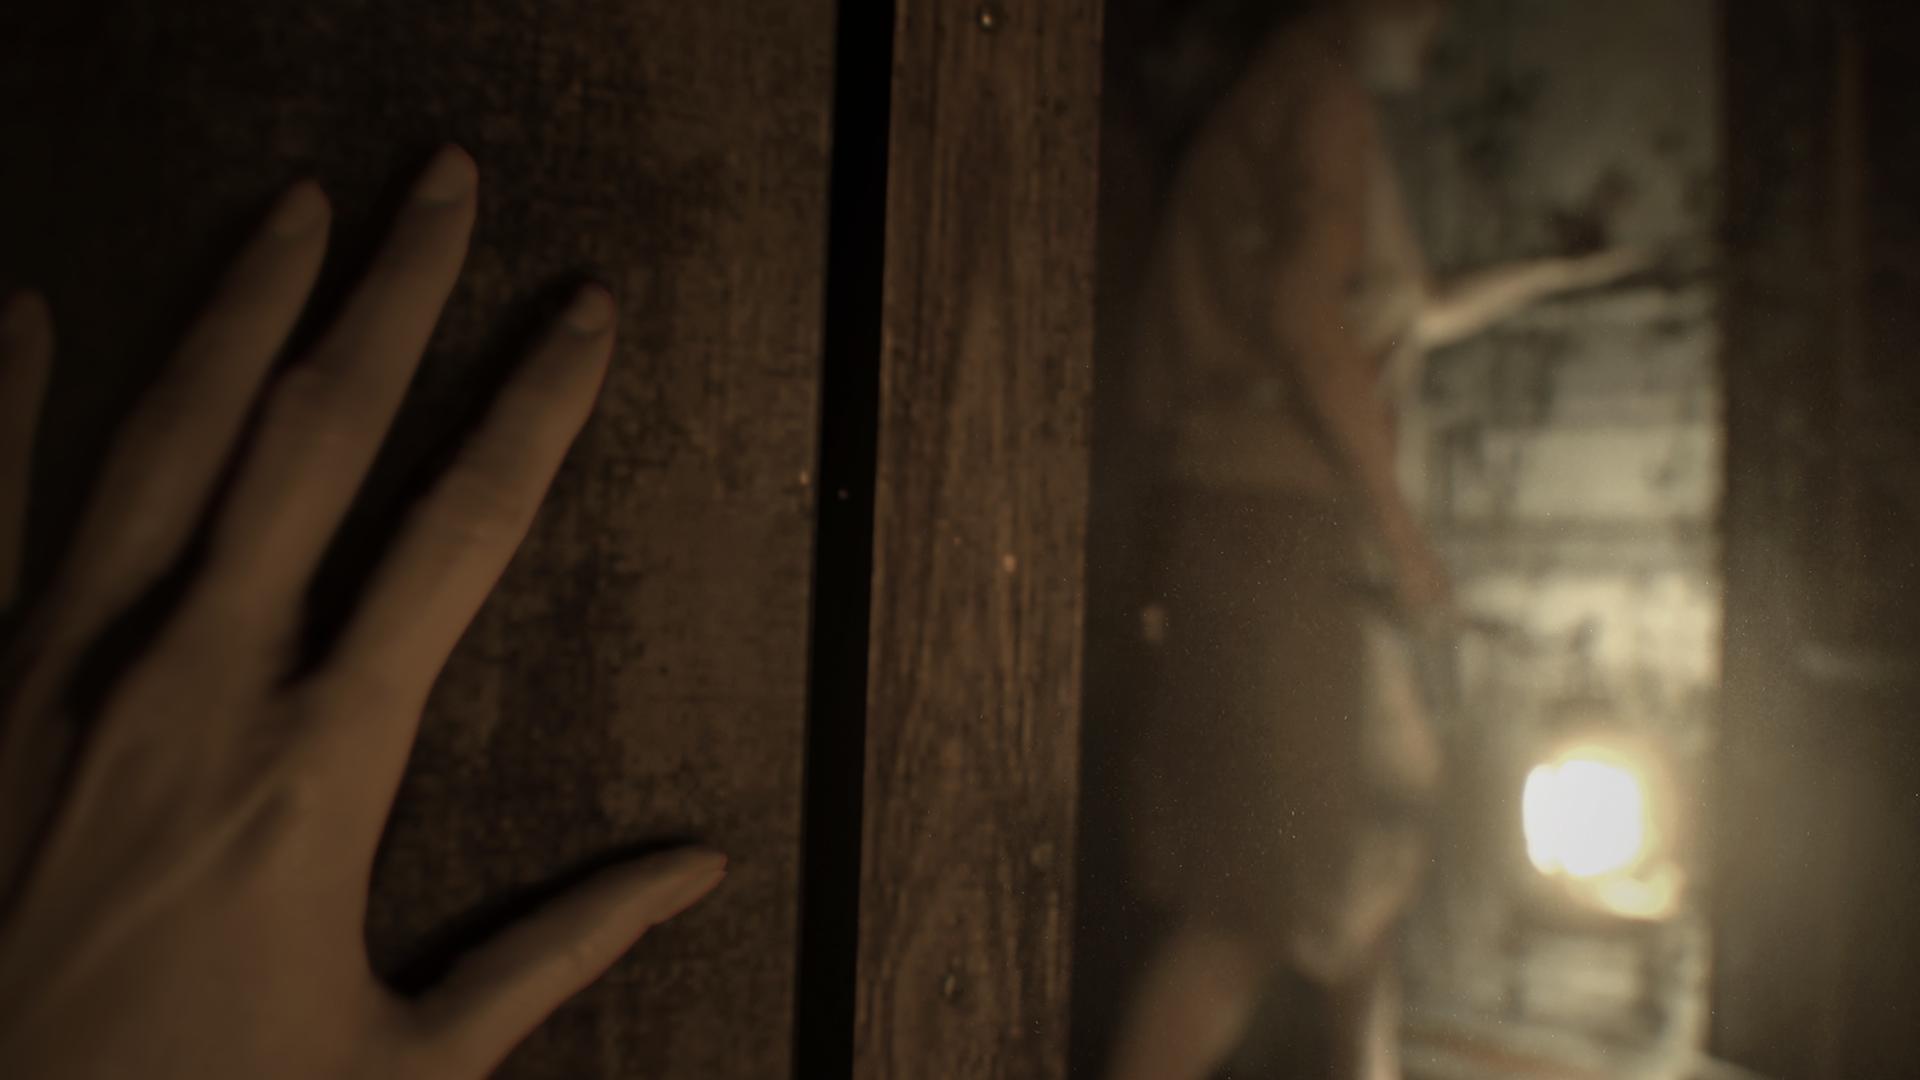 Watch Resident Evil 7 S Creepy New Trailer The Escapist